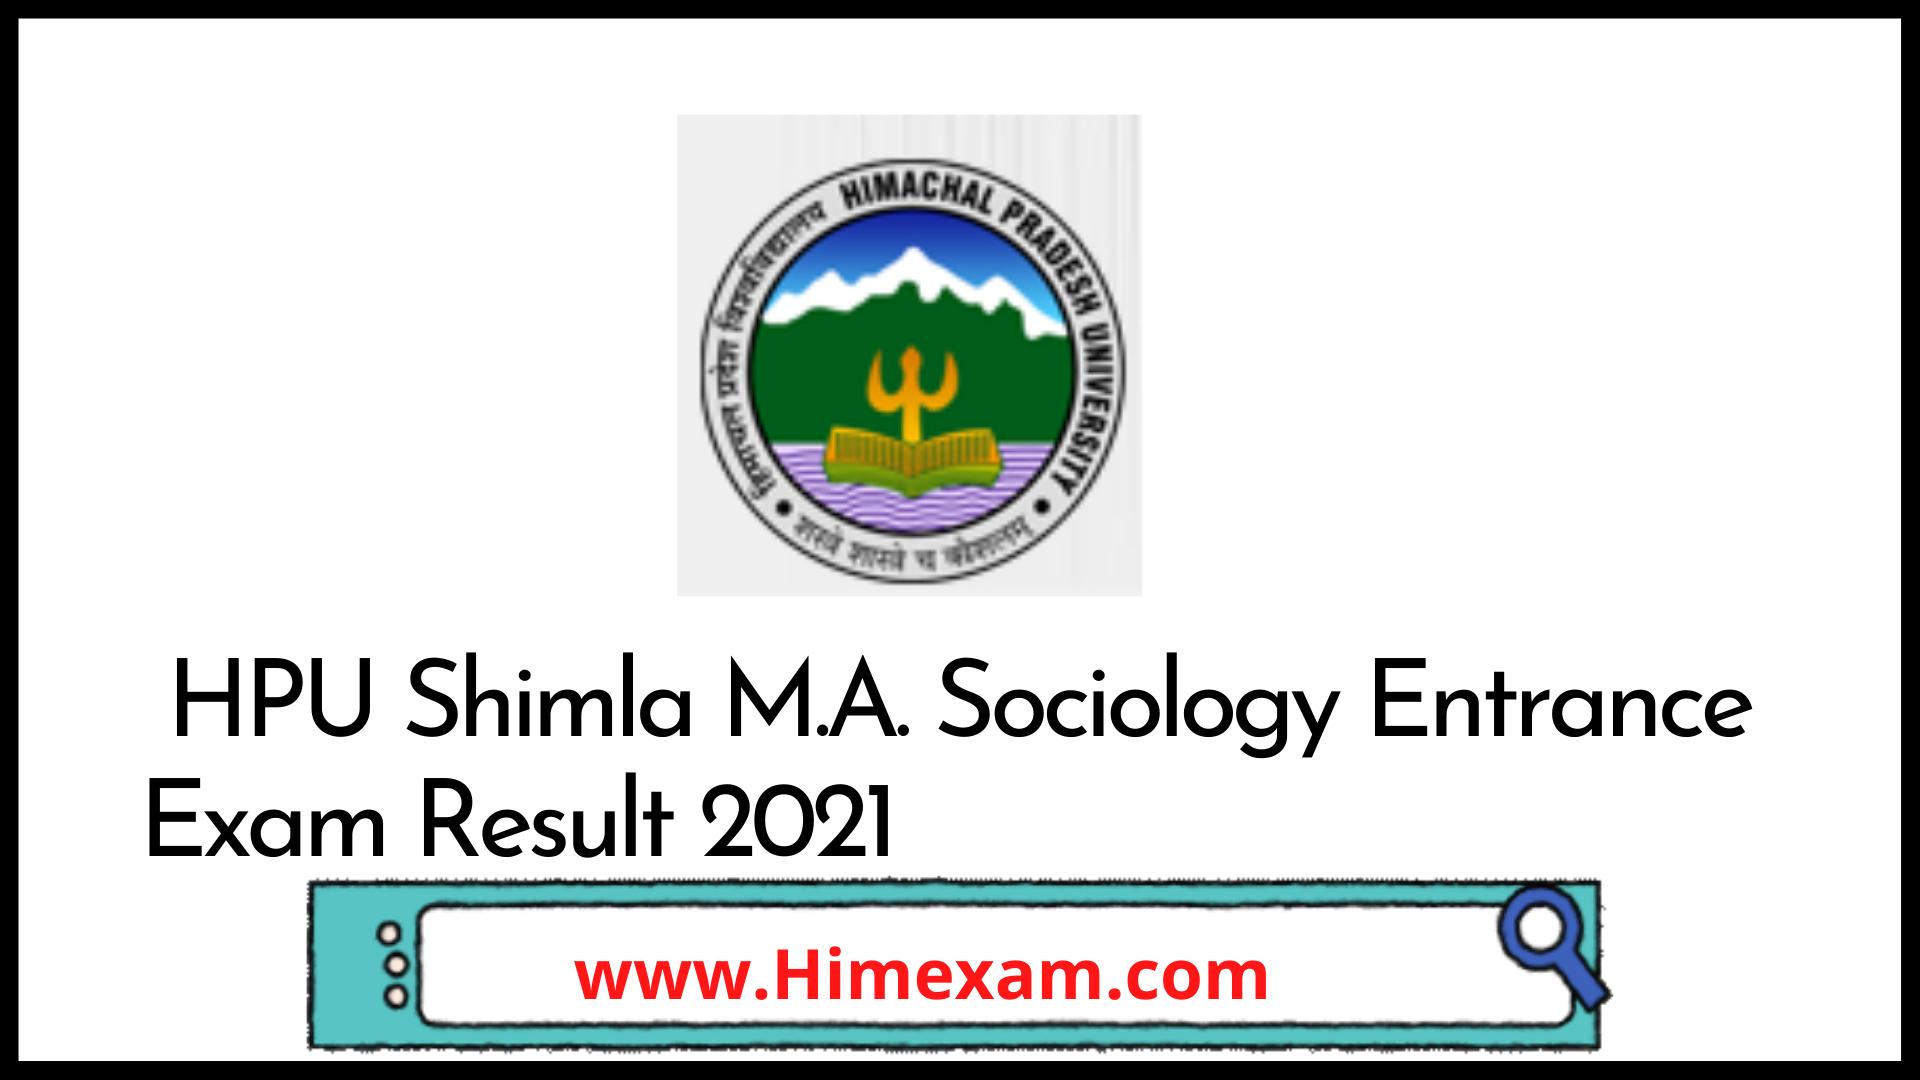 HPU Shimla M.A. Sociology Entrance Exam Result 2021